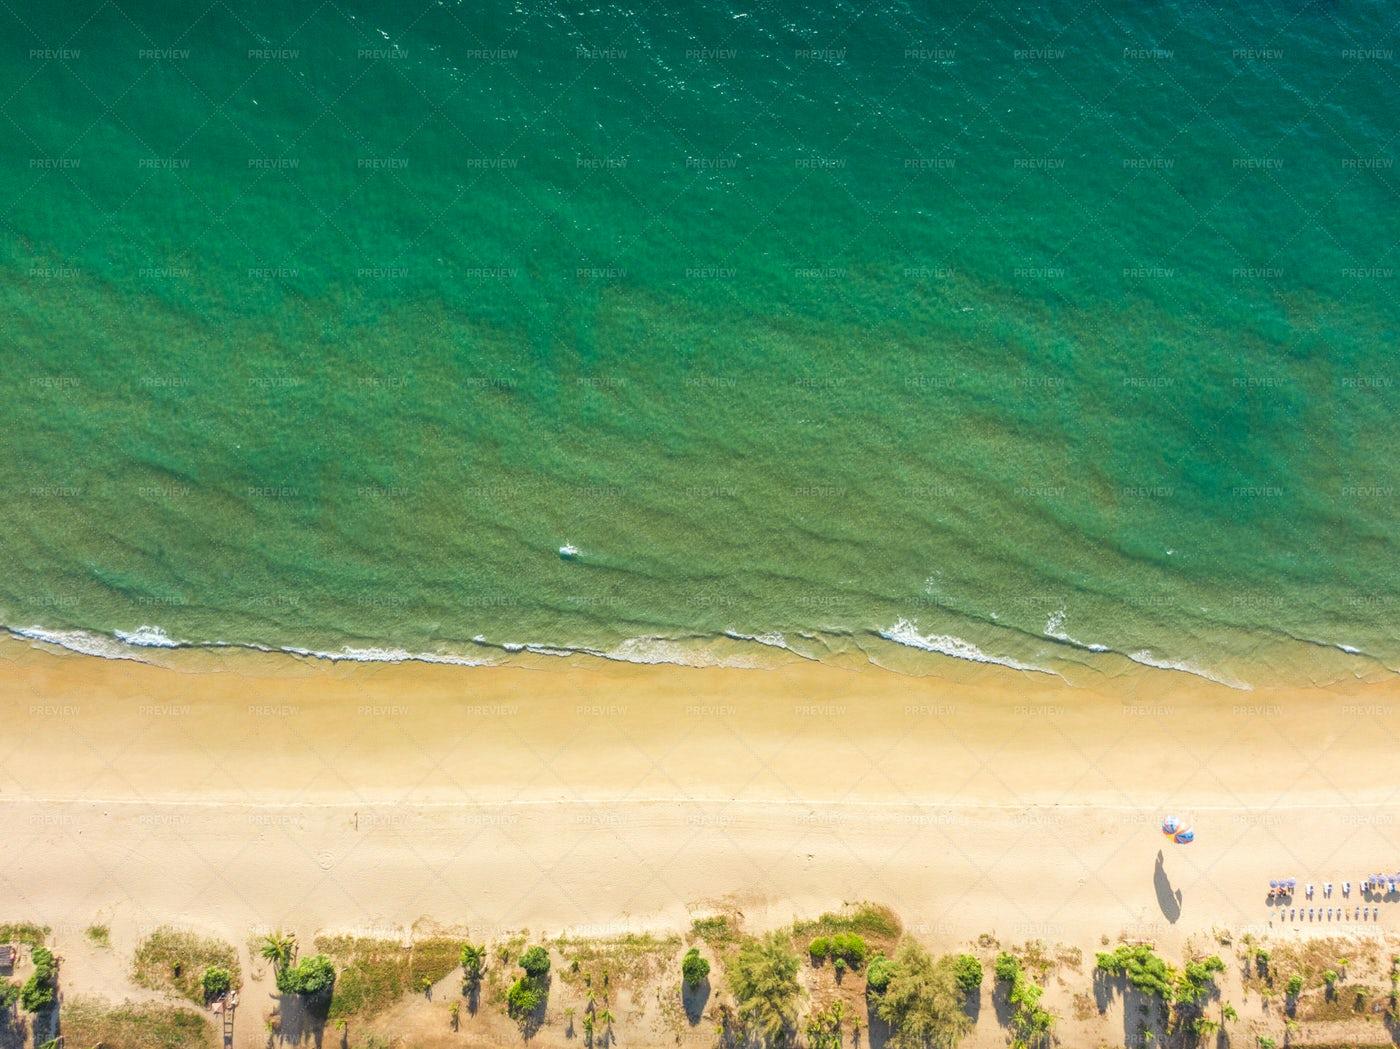 Top View Sandy Beach And Emerald Ocean: Stock Photos